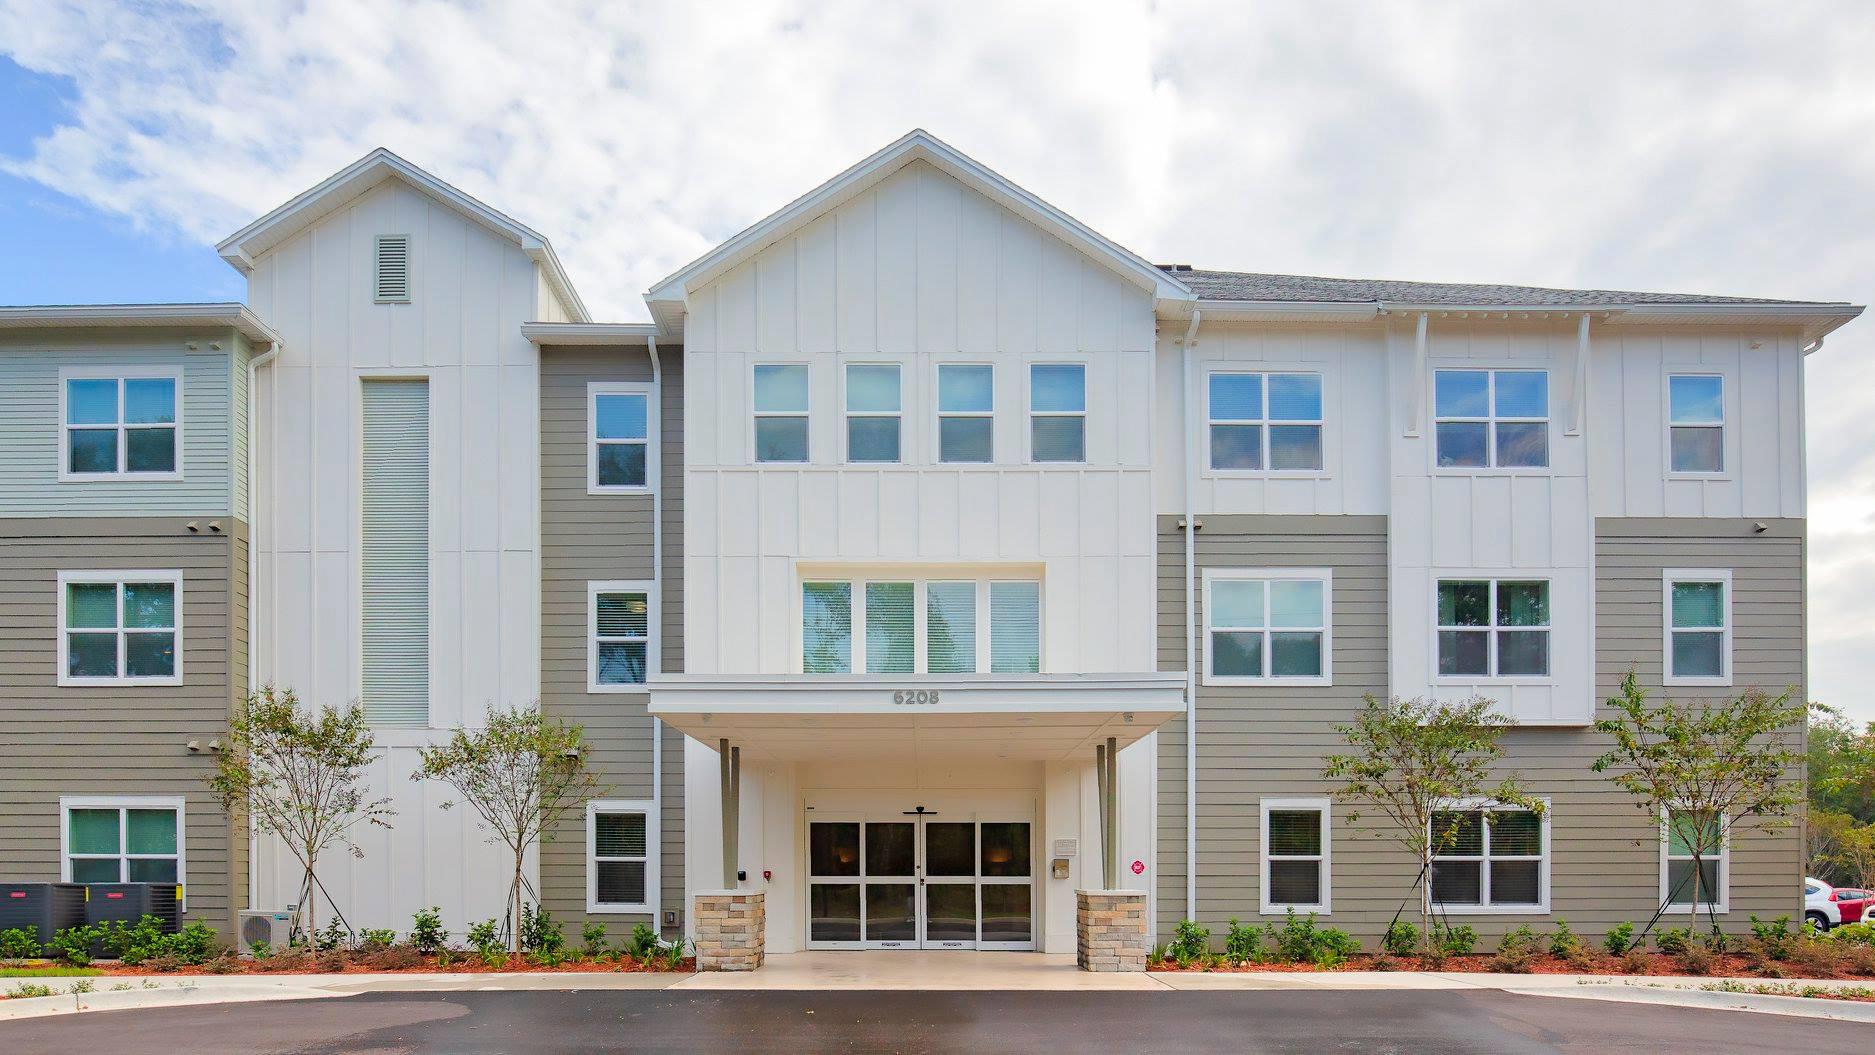 Multi story apartment complex main entrance